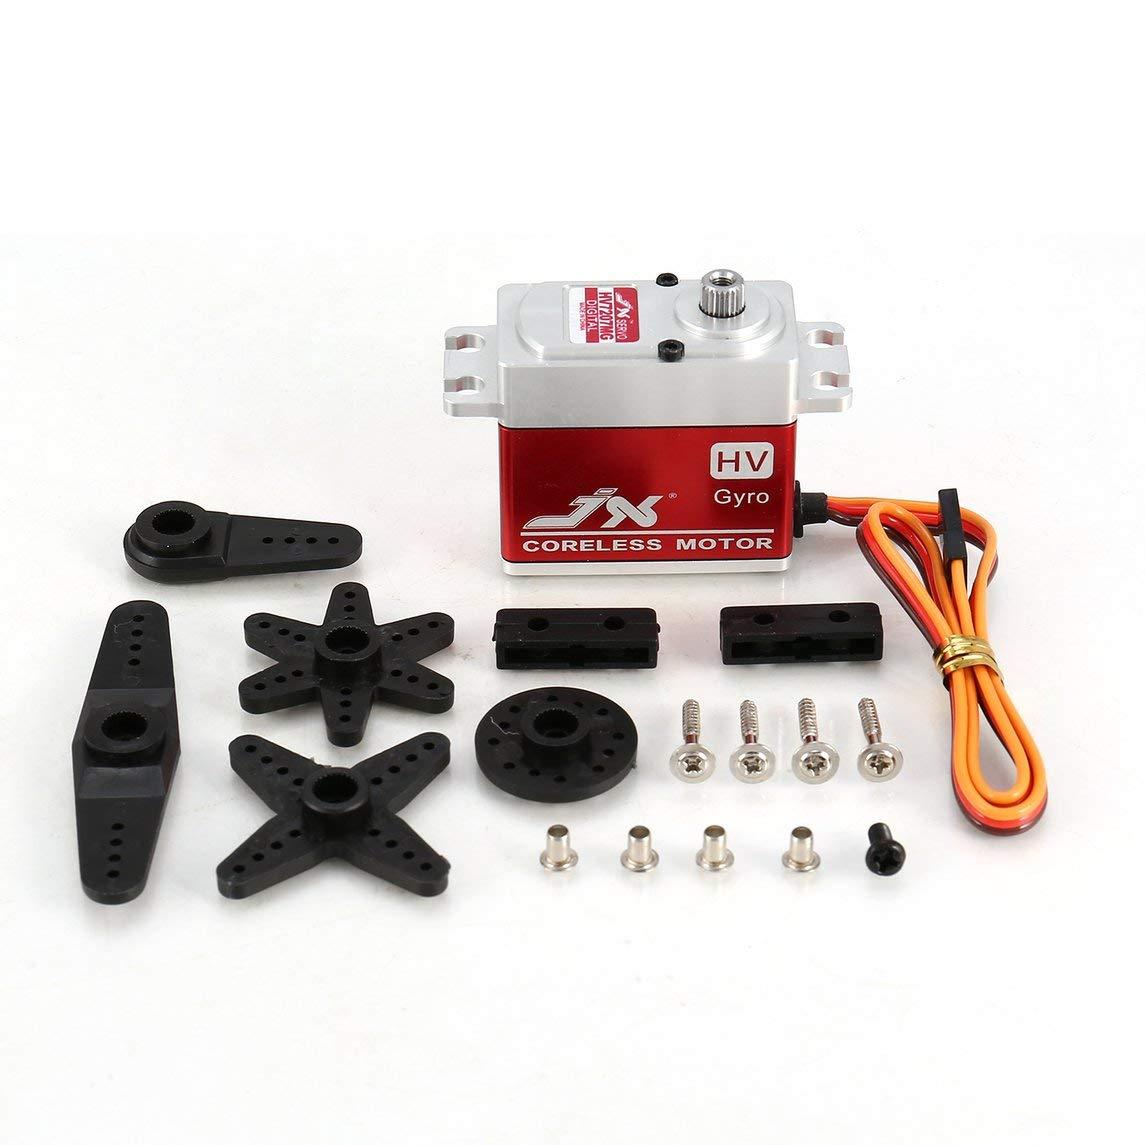 Jasnyfall JX PDI-HV7207MG 7KG CNC Lenkung Digital Metallgetriebe HV Coreless Servo RC Auto Silber und Rot